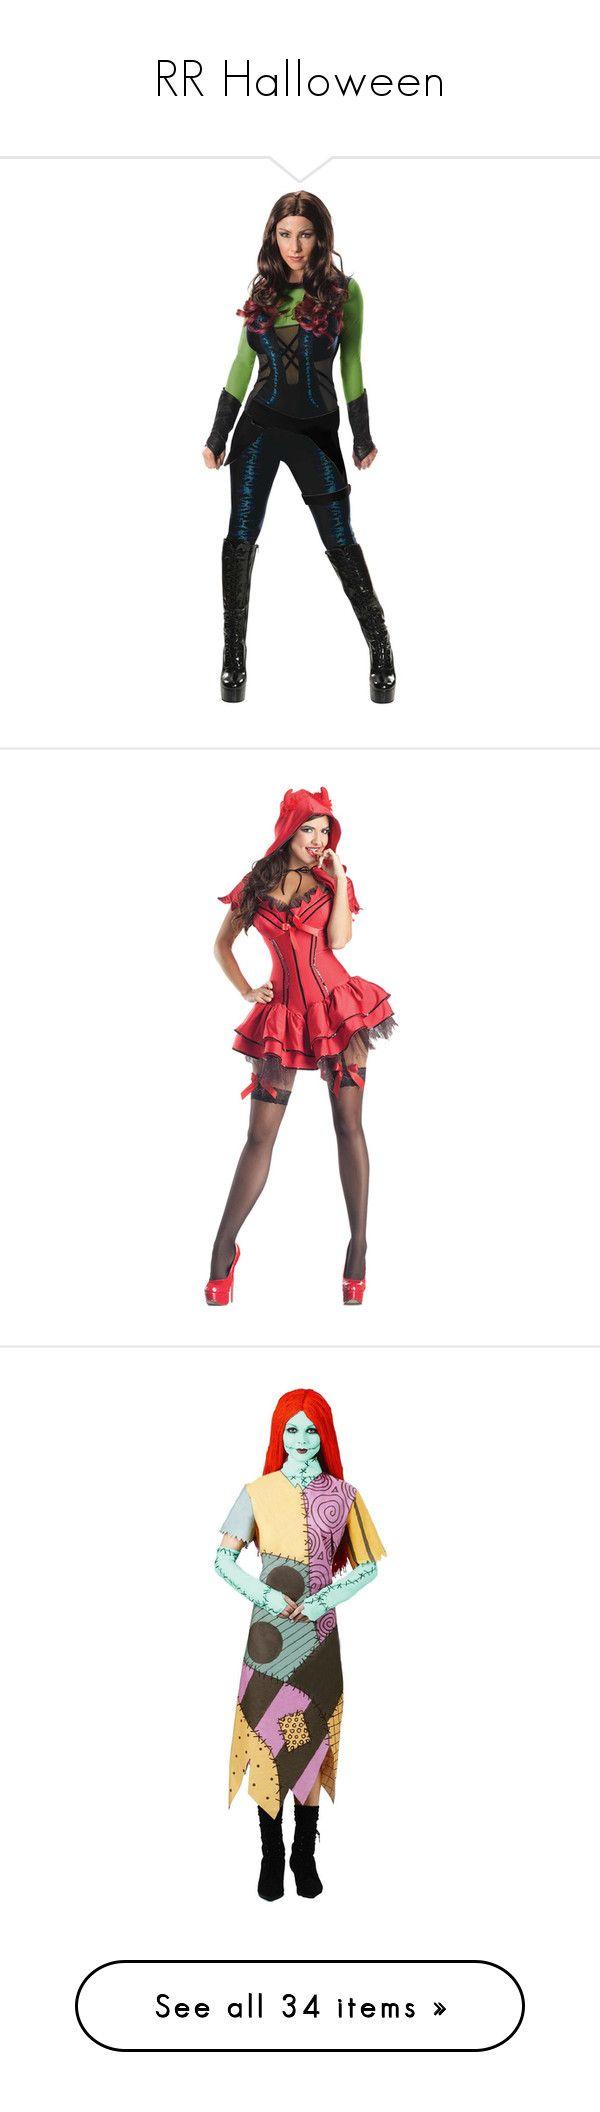 Best 25+ Alien halloween costume ideas on Pinterest | Alien ...